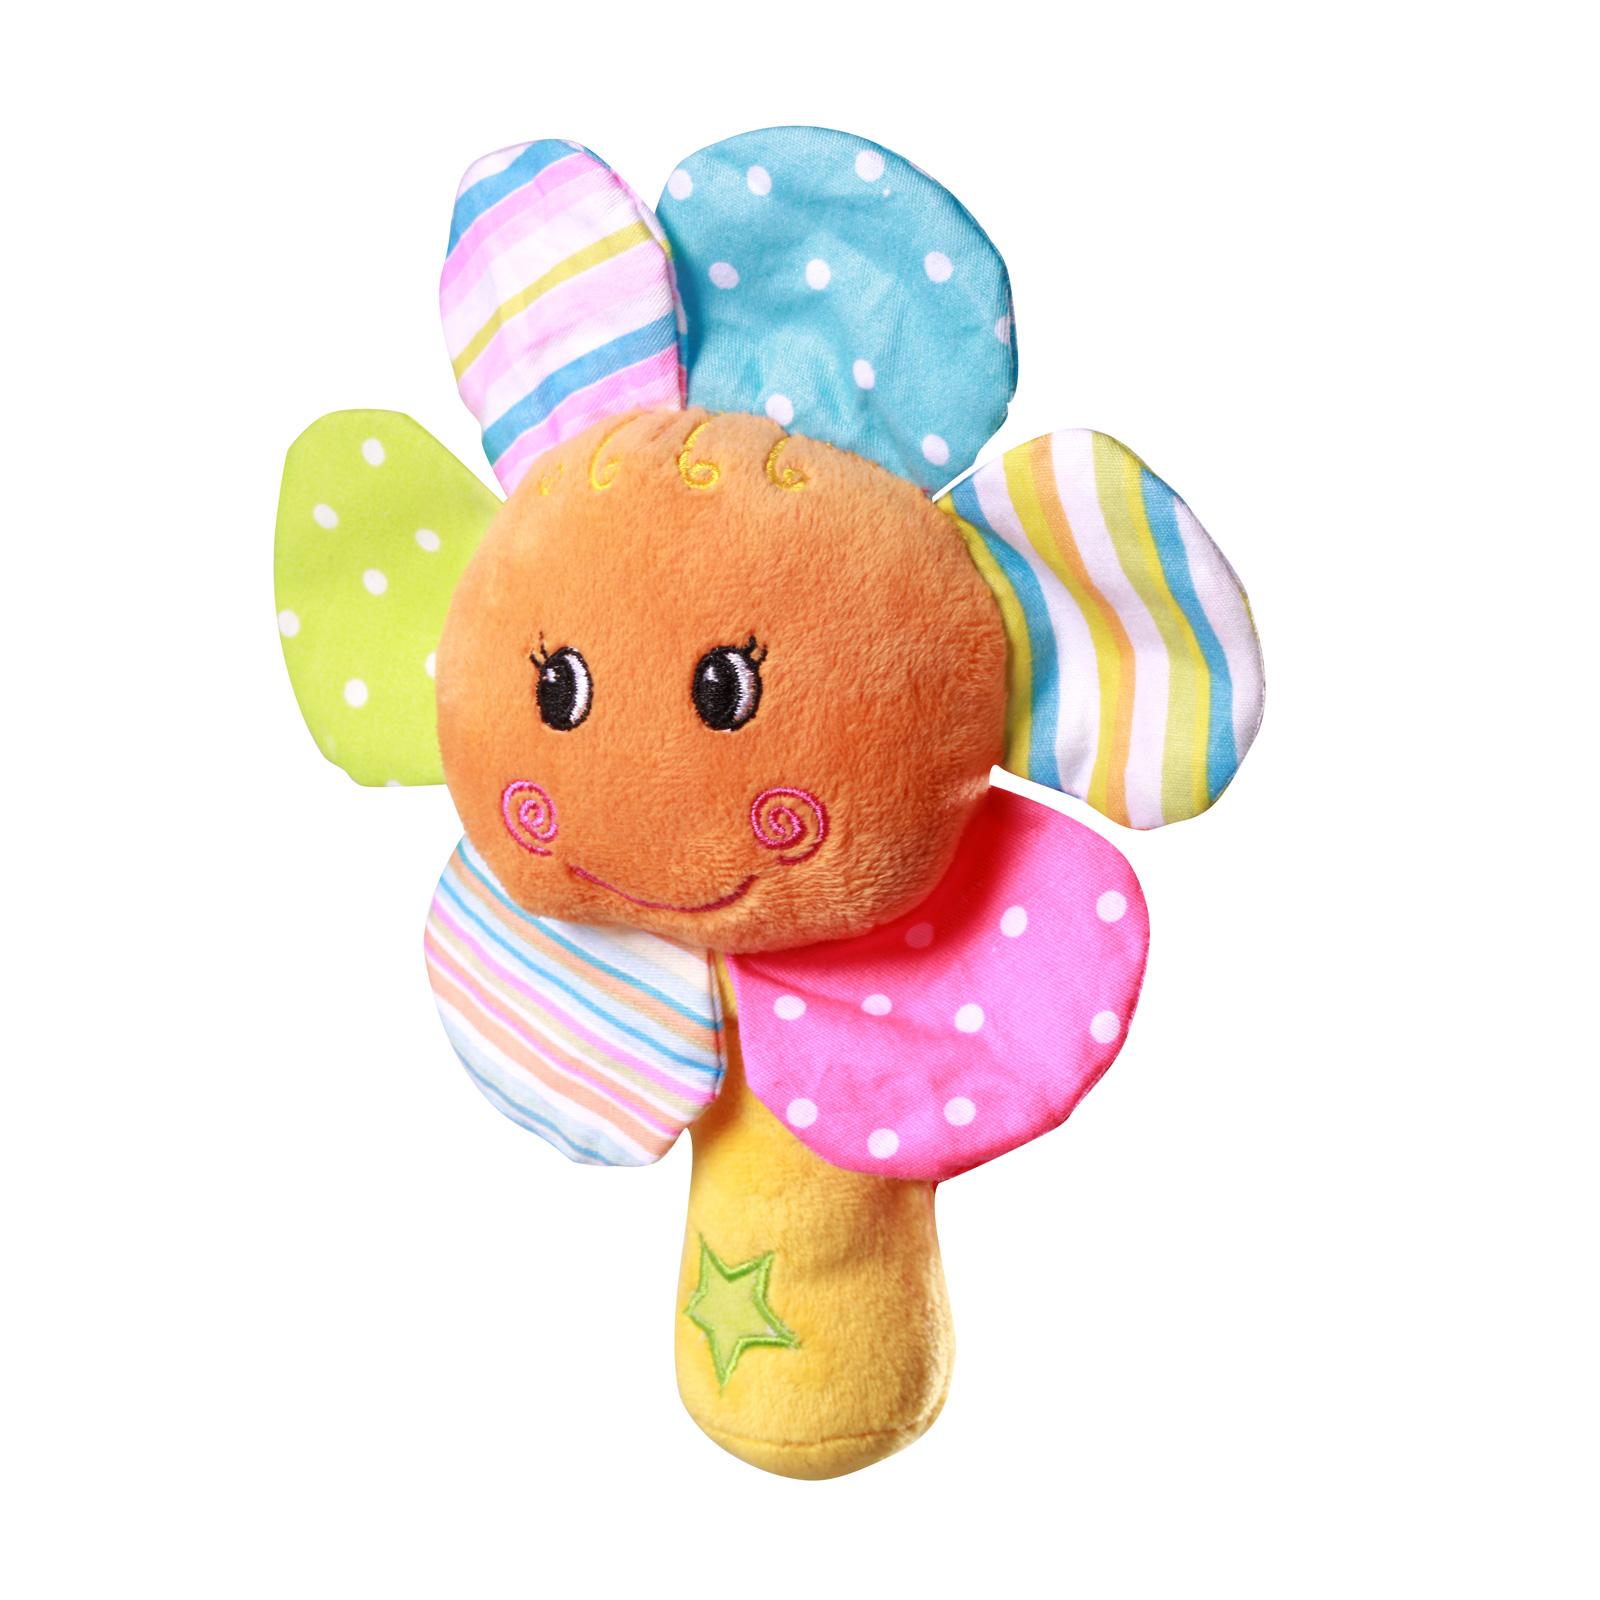 Погремушка BabyOno Цветок велюр<br>